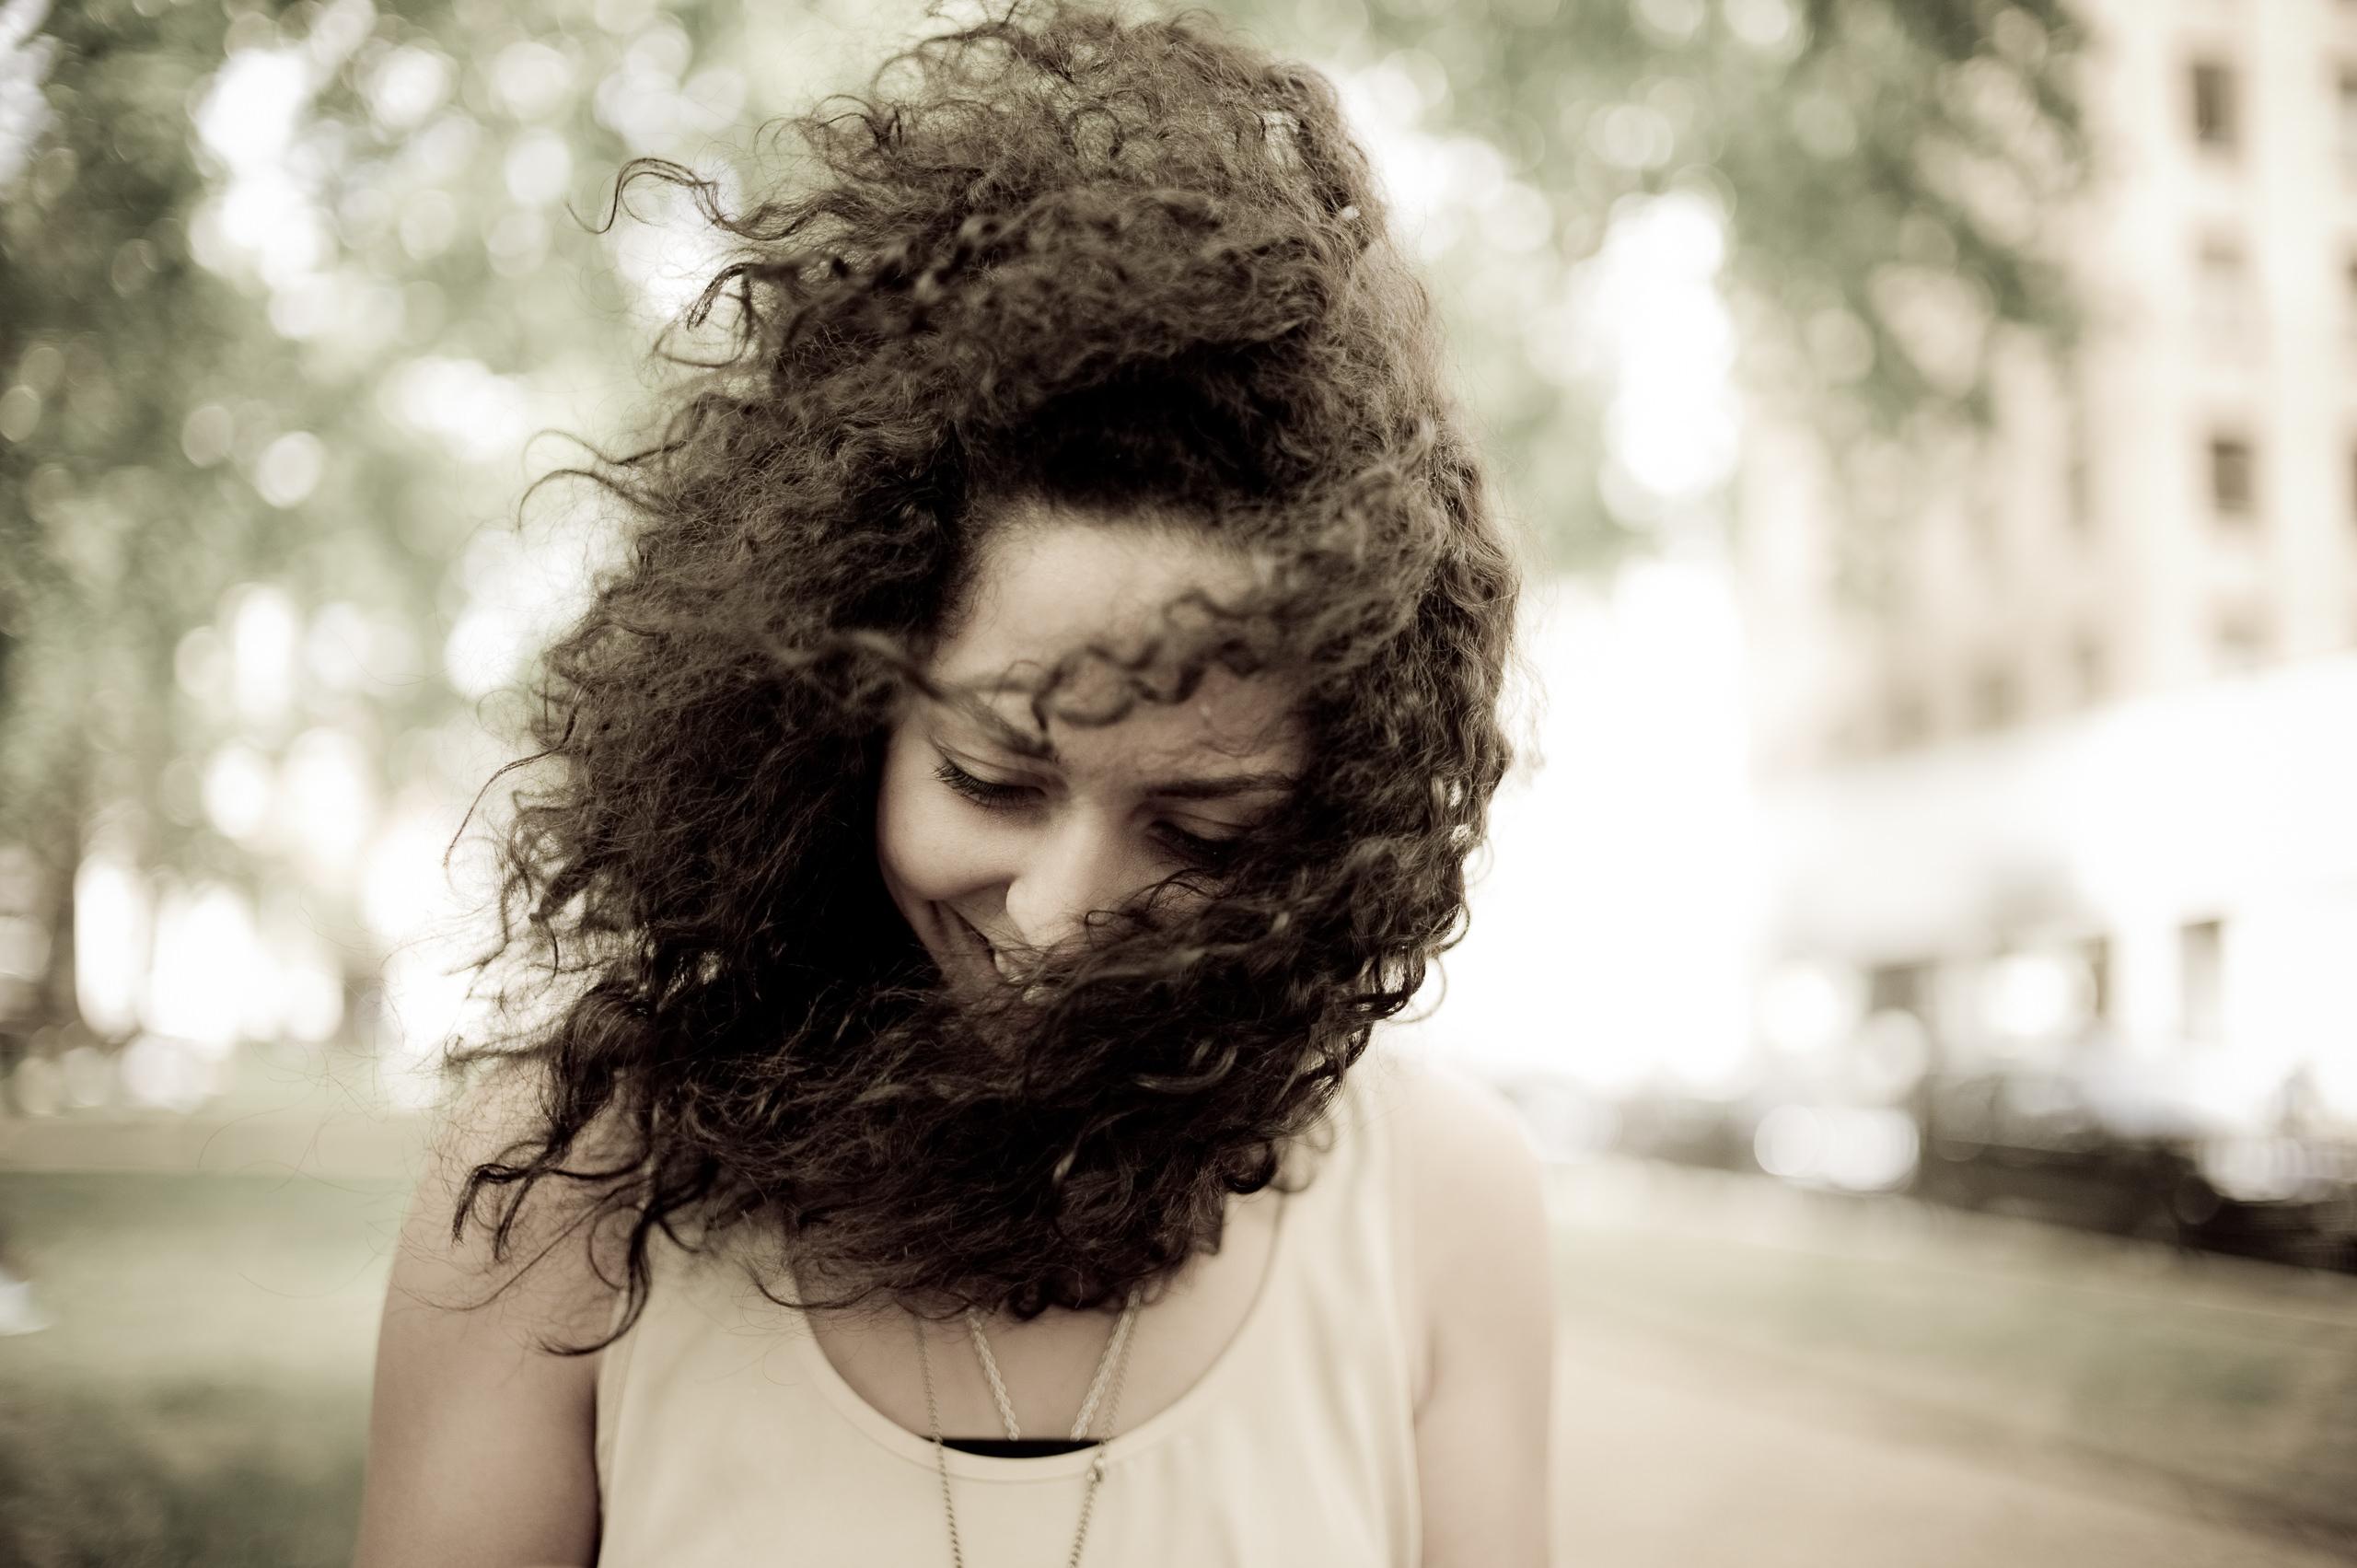 World Gallery Enviromental Portrait Wind In The Hair By Brett Leica Photographer